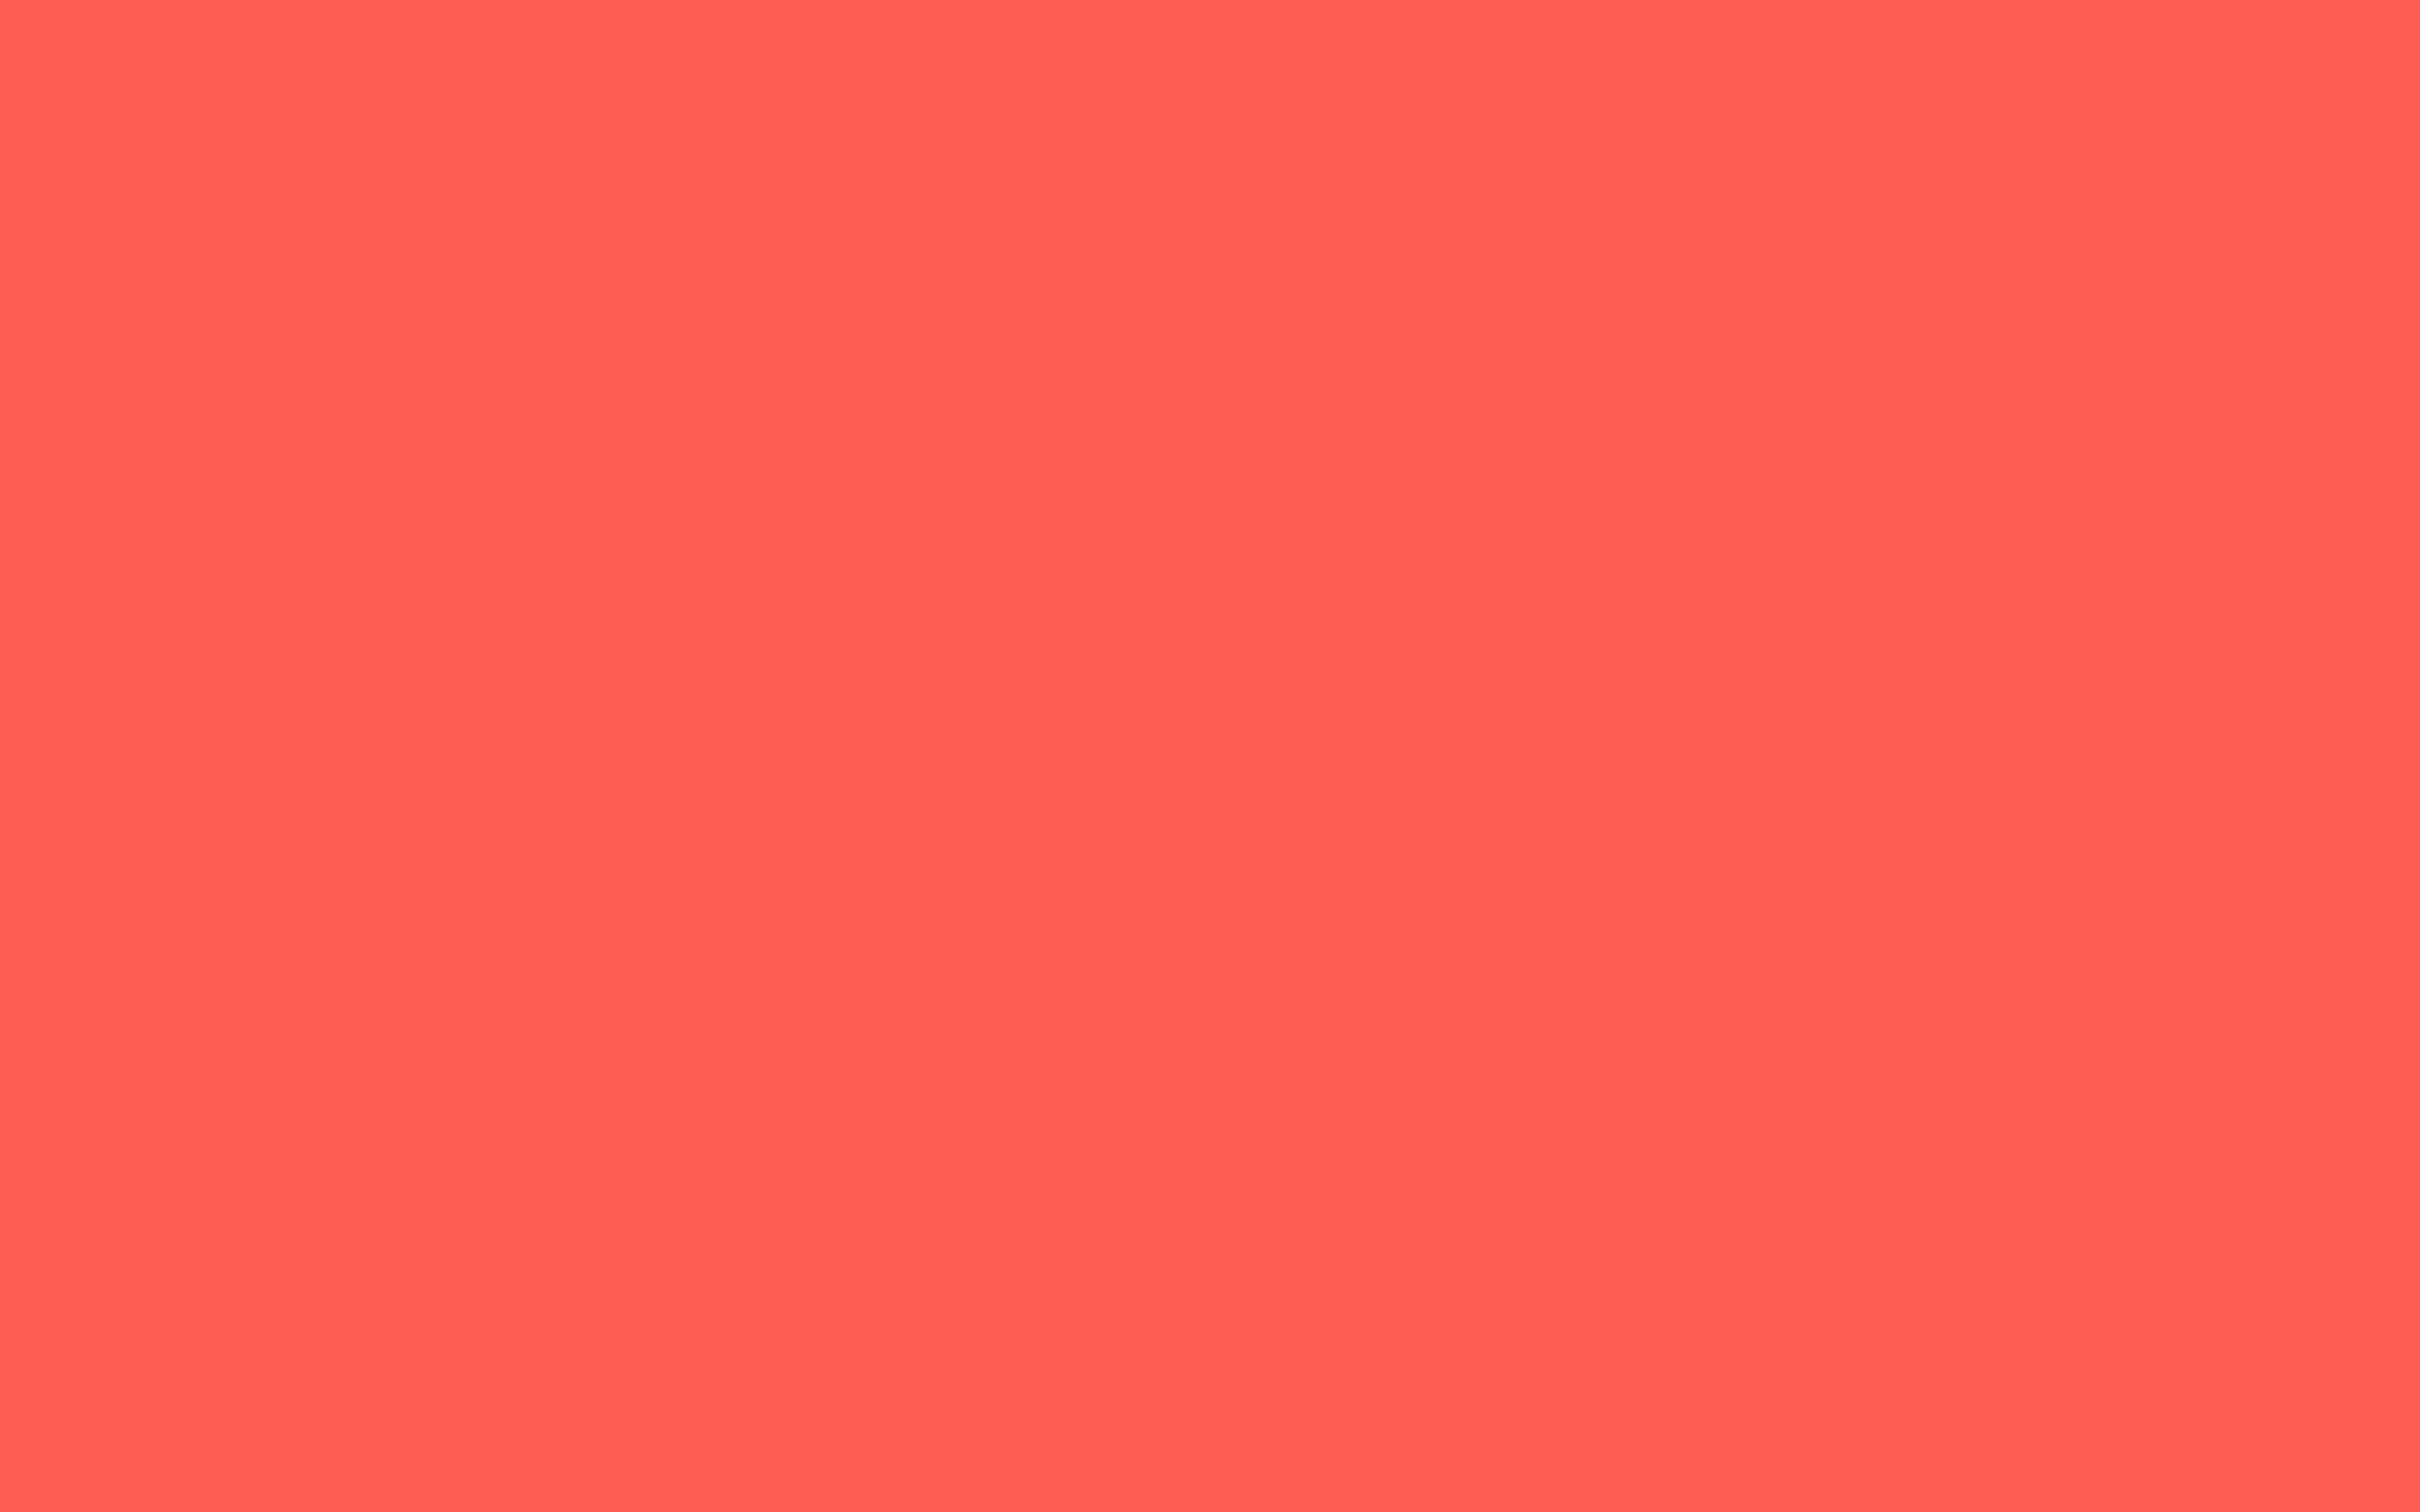 Solid Color Wallpaper Background 982